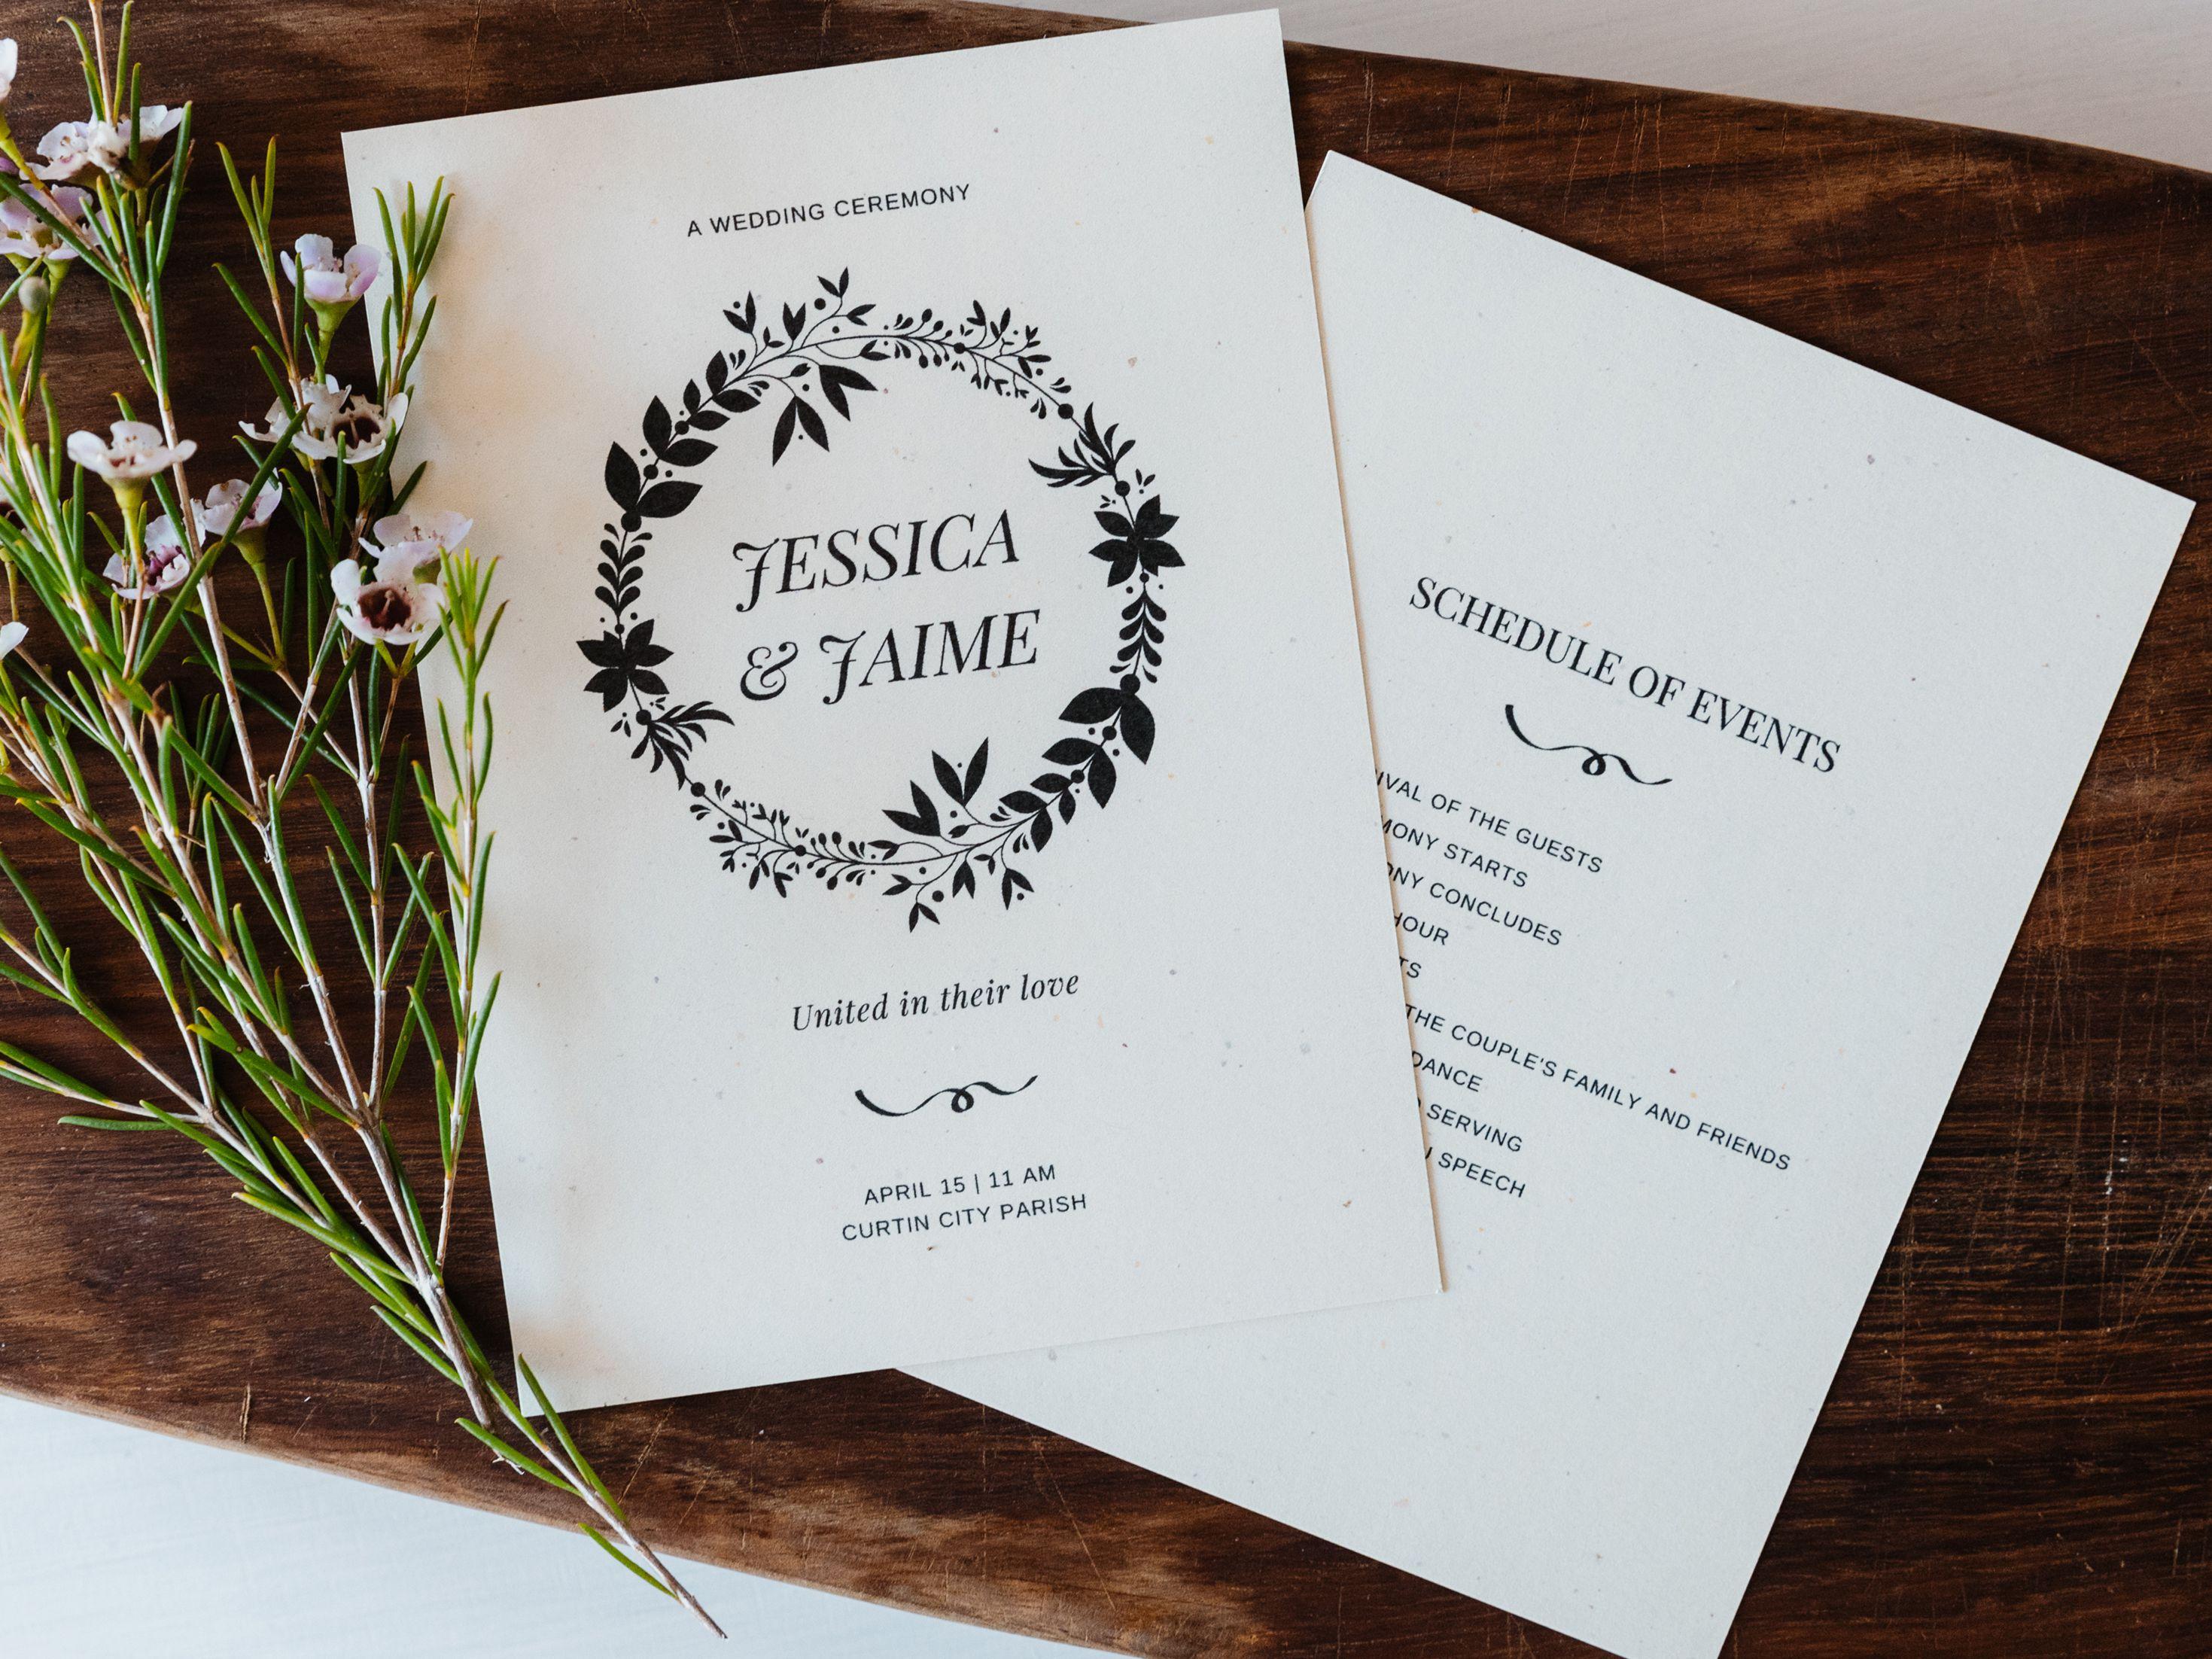 free wedding program templates you can